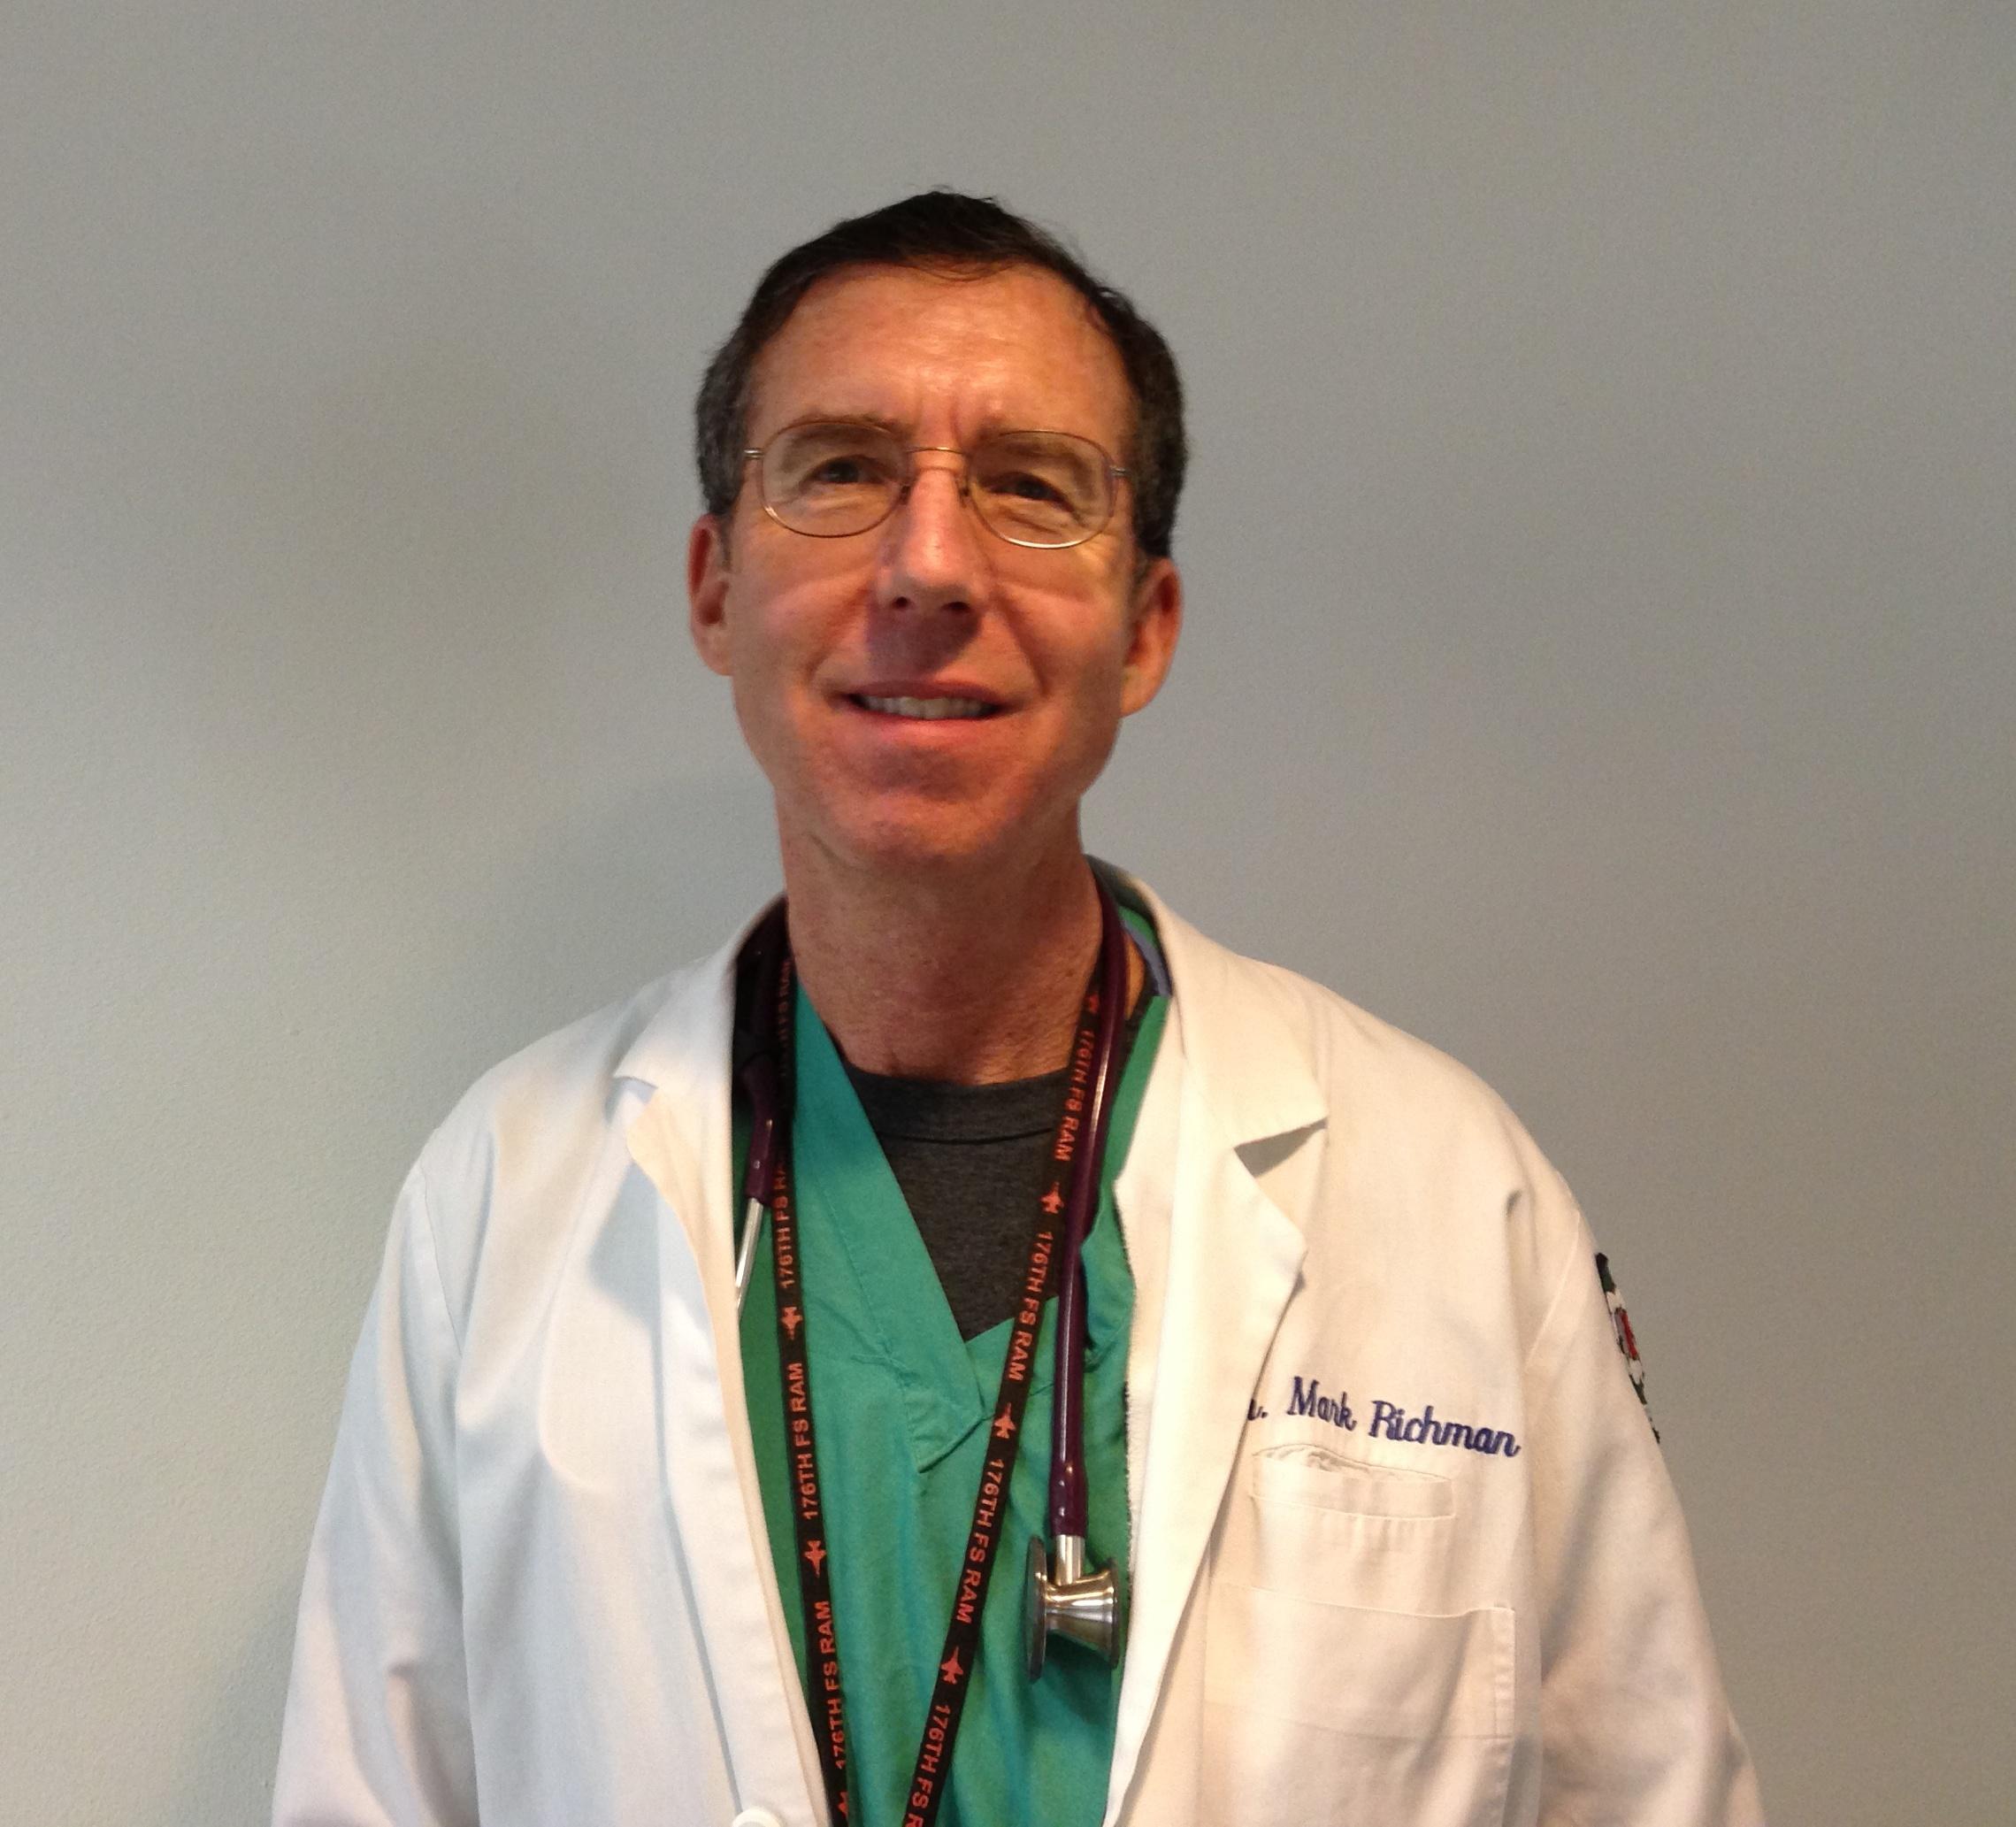 Dr. Mark Richman